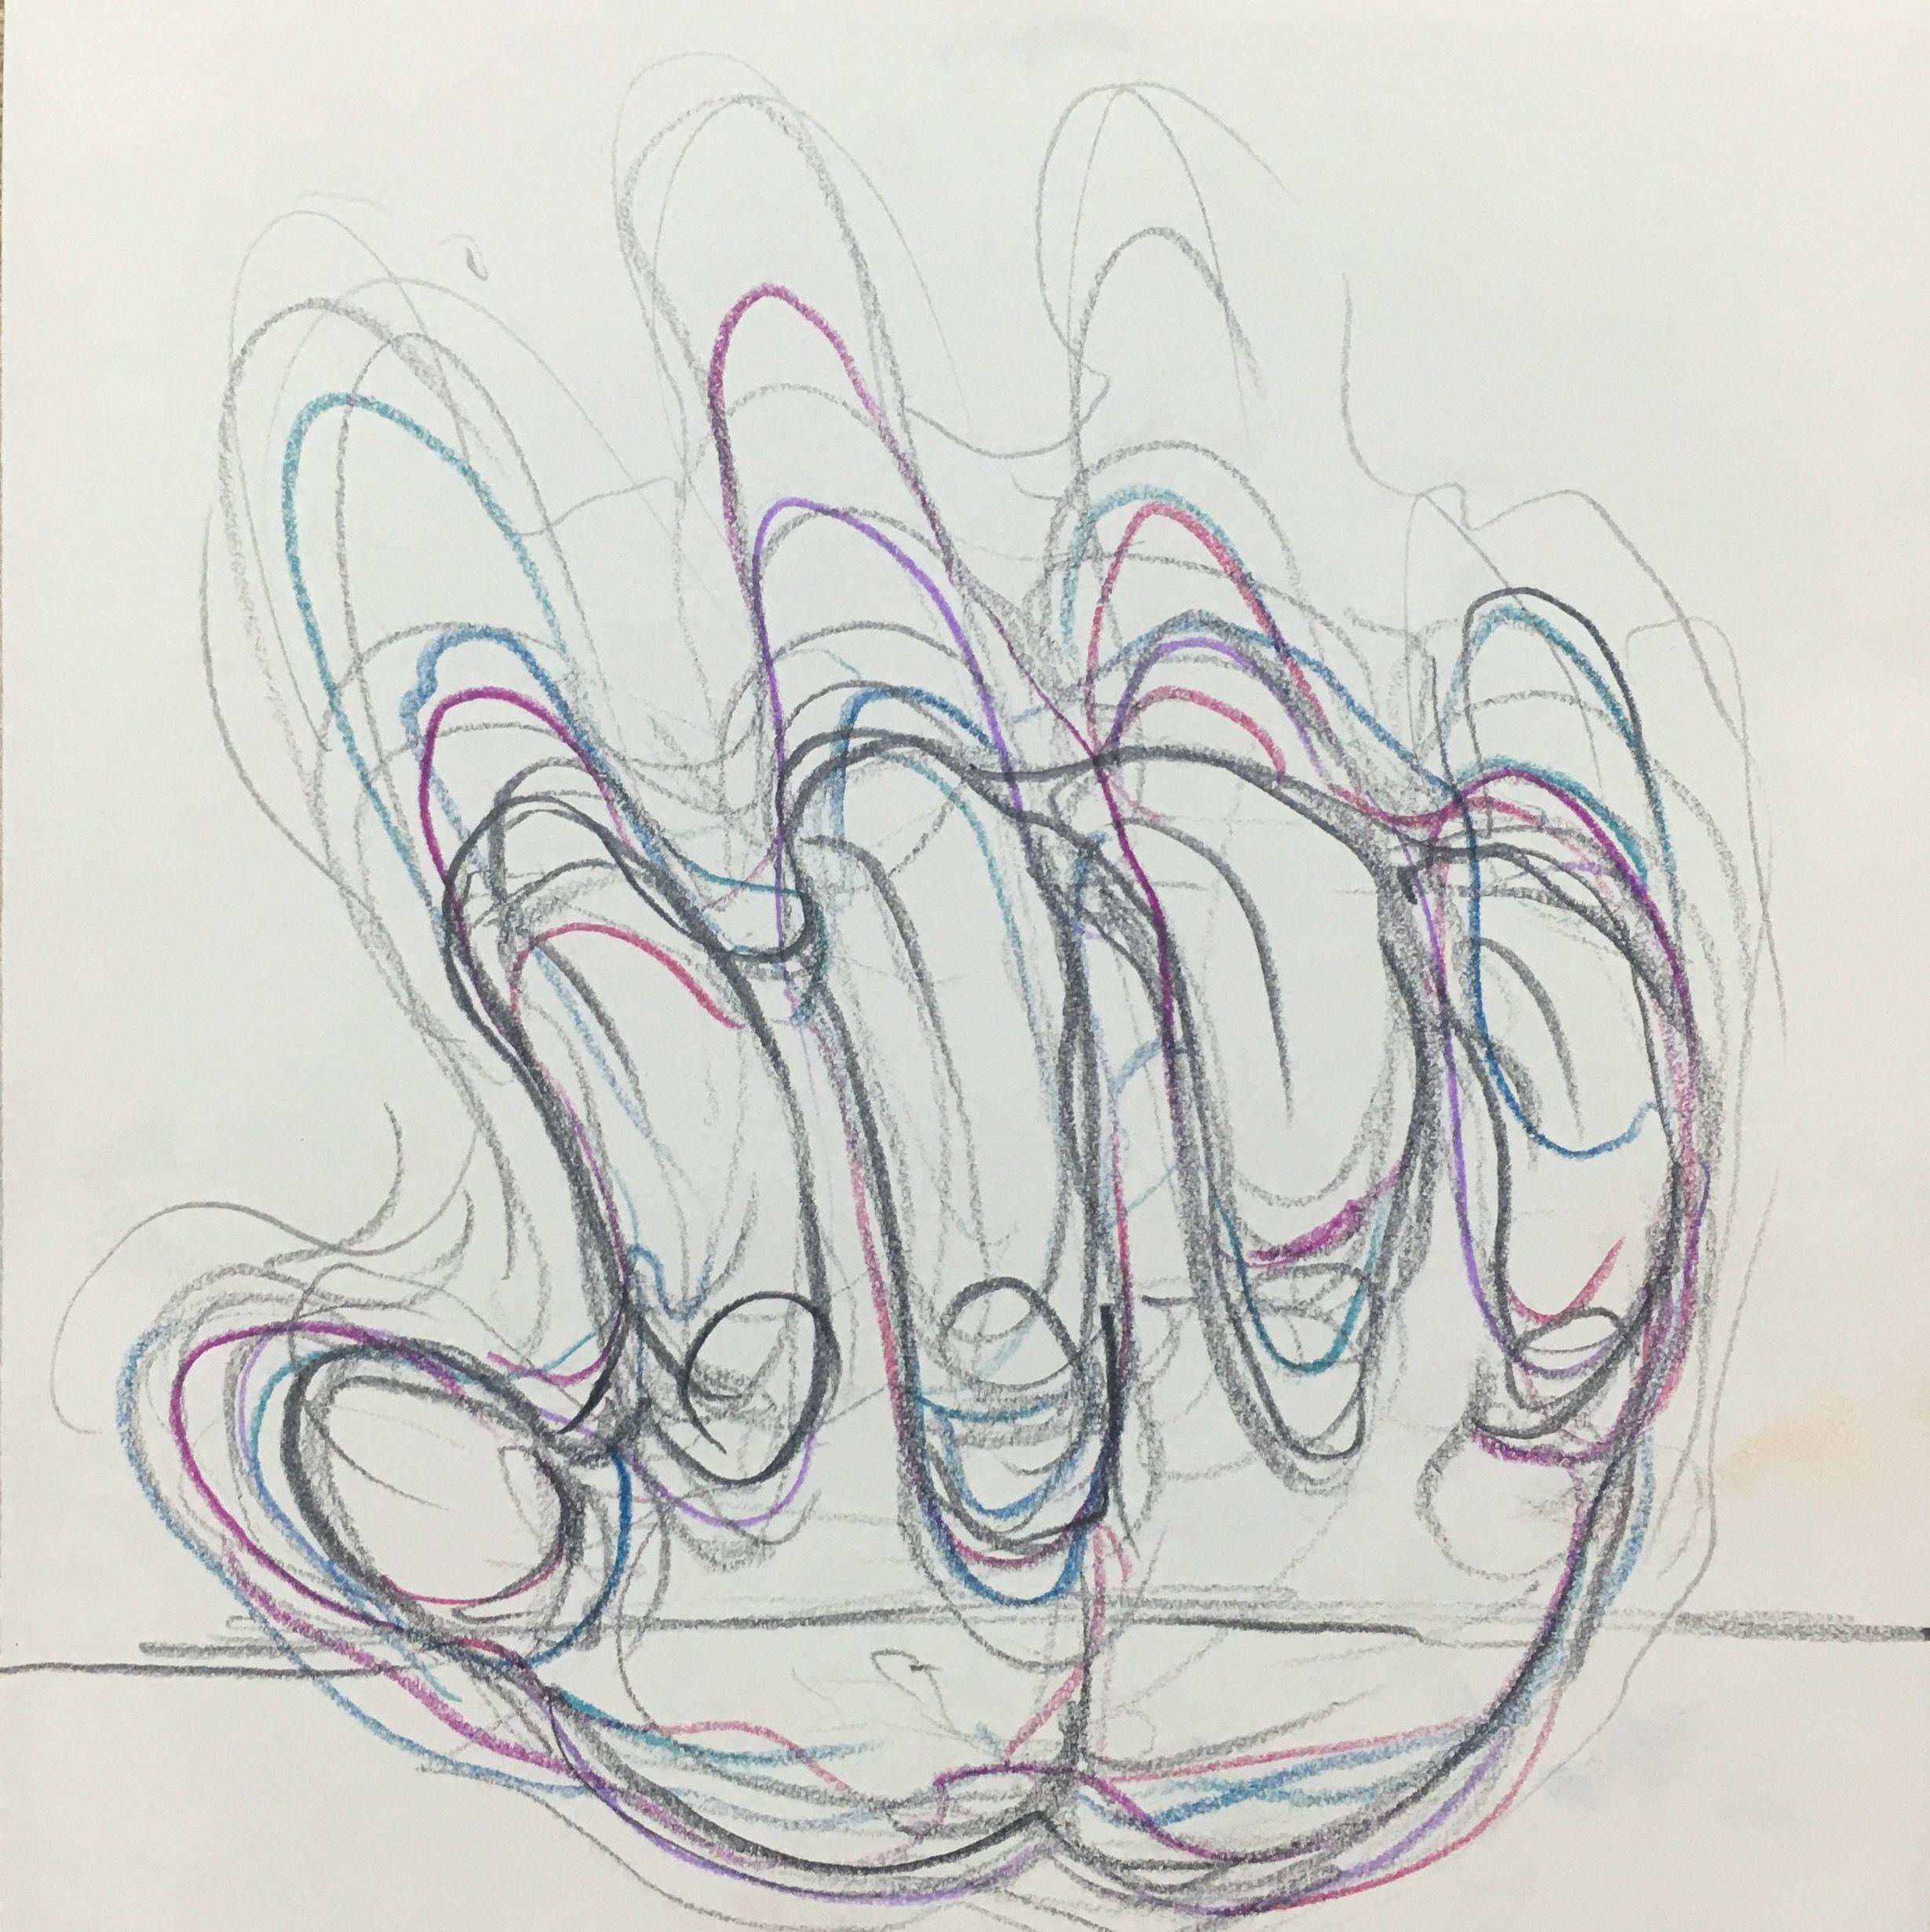 gesture-키보드두드리기